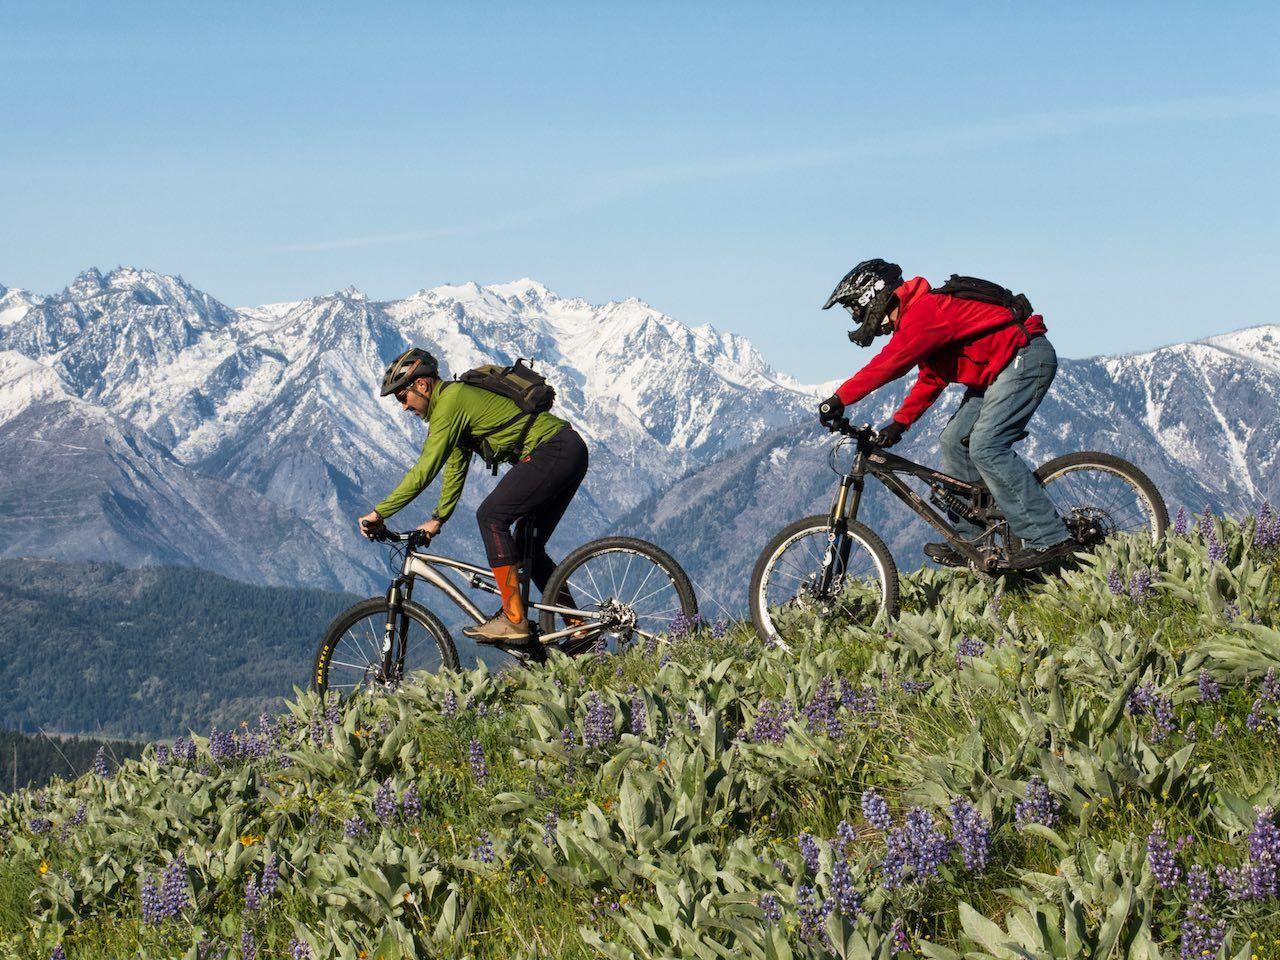 Leavenworth mountain biking